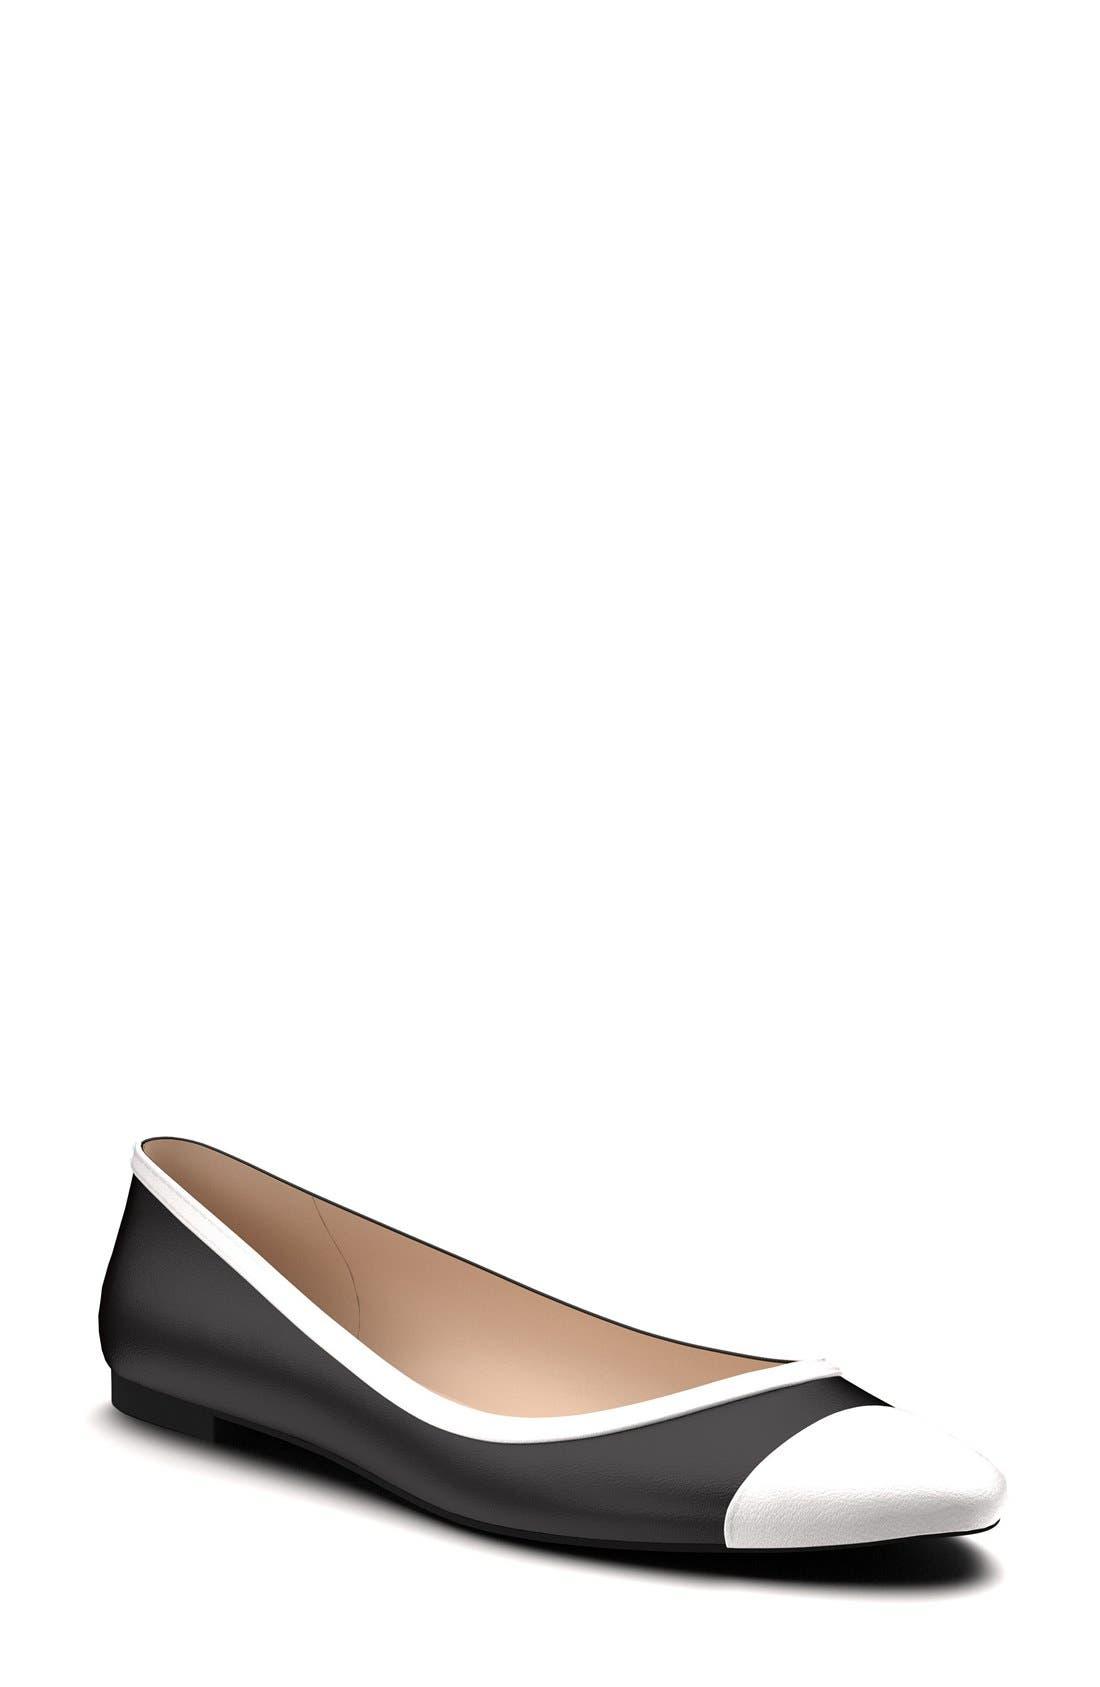 Alternate Image 1 Selected - Shoes of Prey Cap Toe Flat (Women)